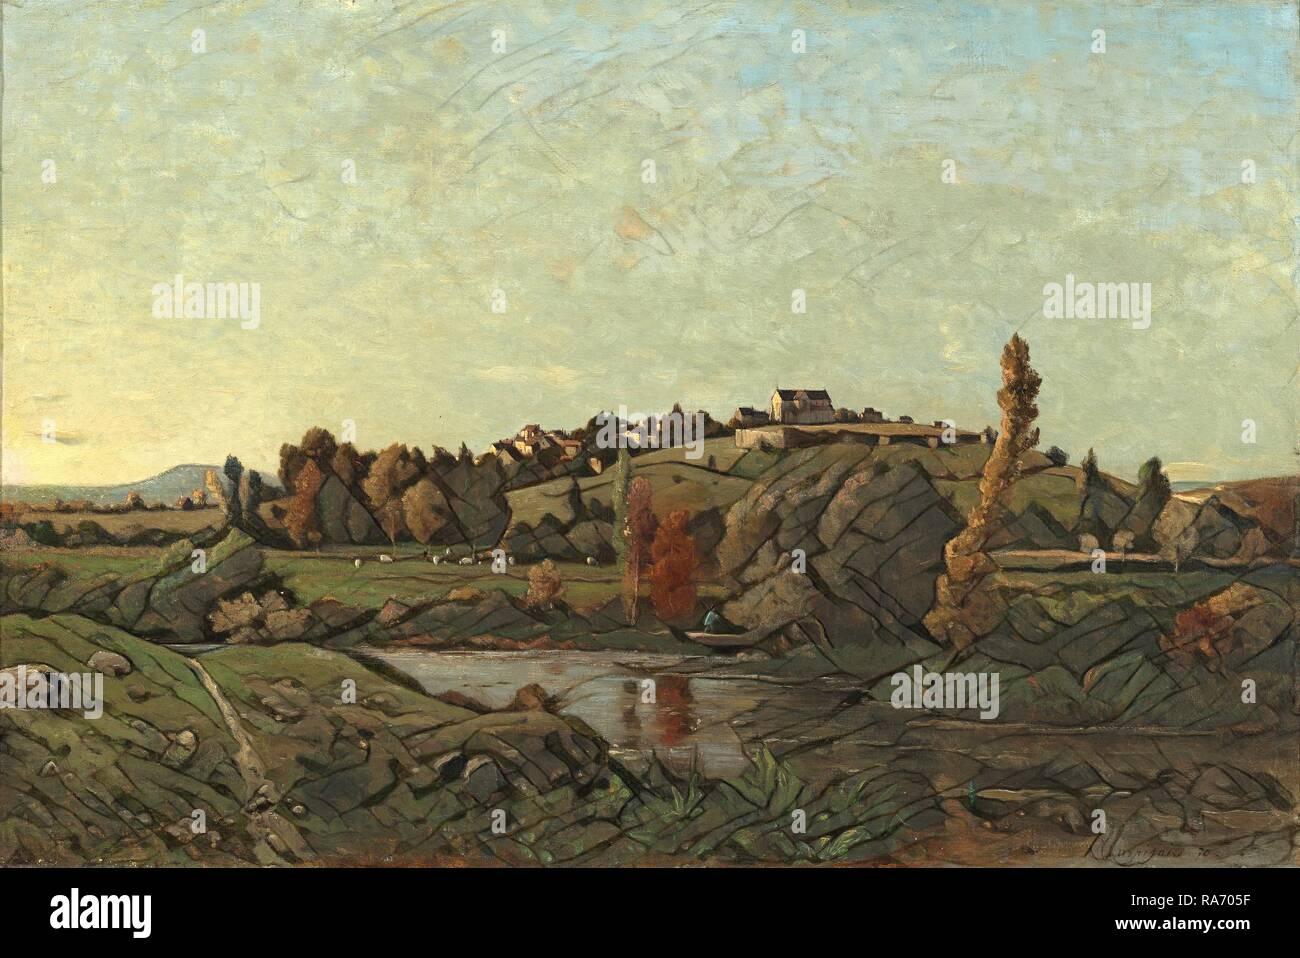 Henri-Joseph Harpignies (French, 1819 - 1916), Landscape in Auvergne, 1870, oil on canvas. Reimagined - Stock Image